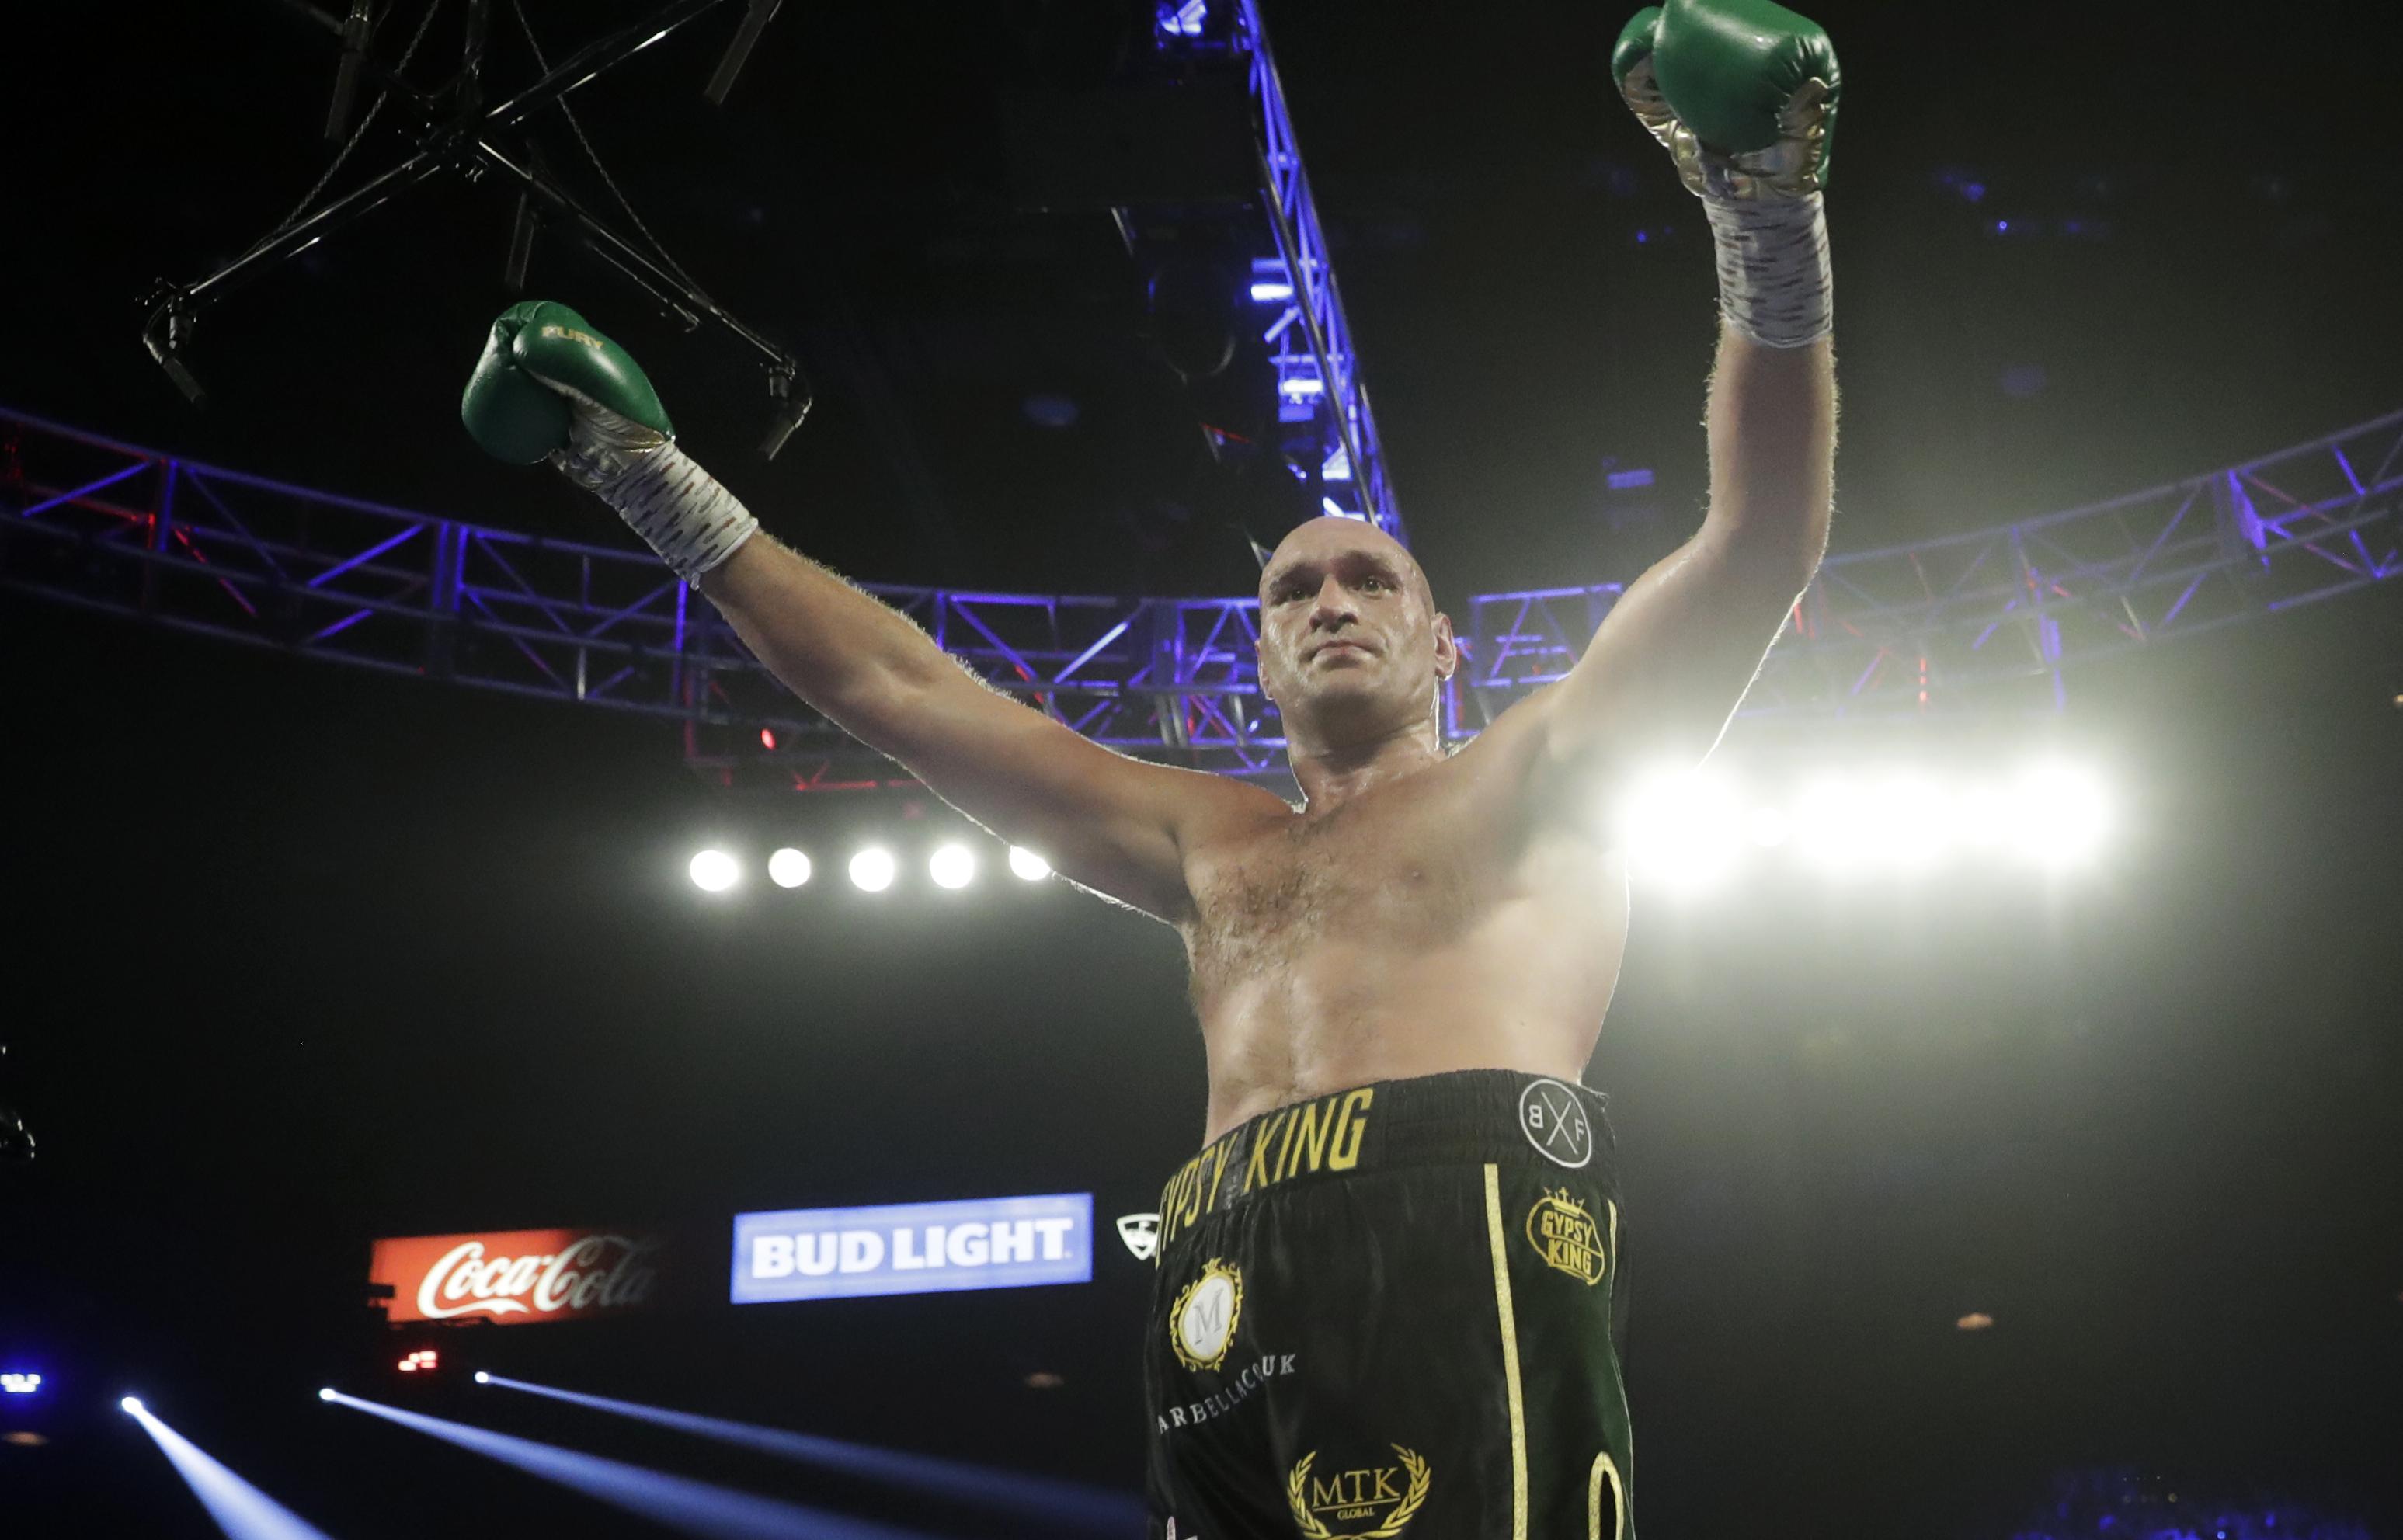 Tyson Fury, of England, celebrates during a WBC heavyweight championship boxing match against Deontay Wilder Saturday, Feb. 22, 2020, in Las Vegas. (AP Photo/Isaac Brekken)